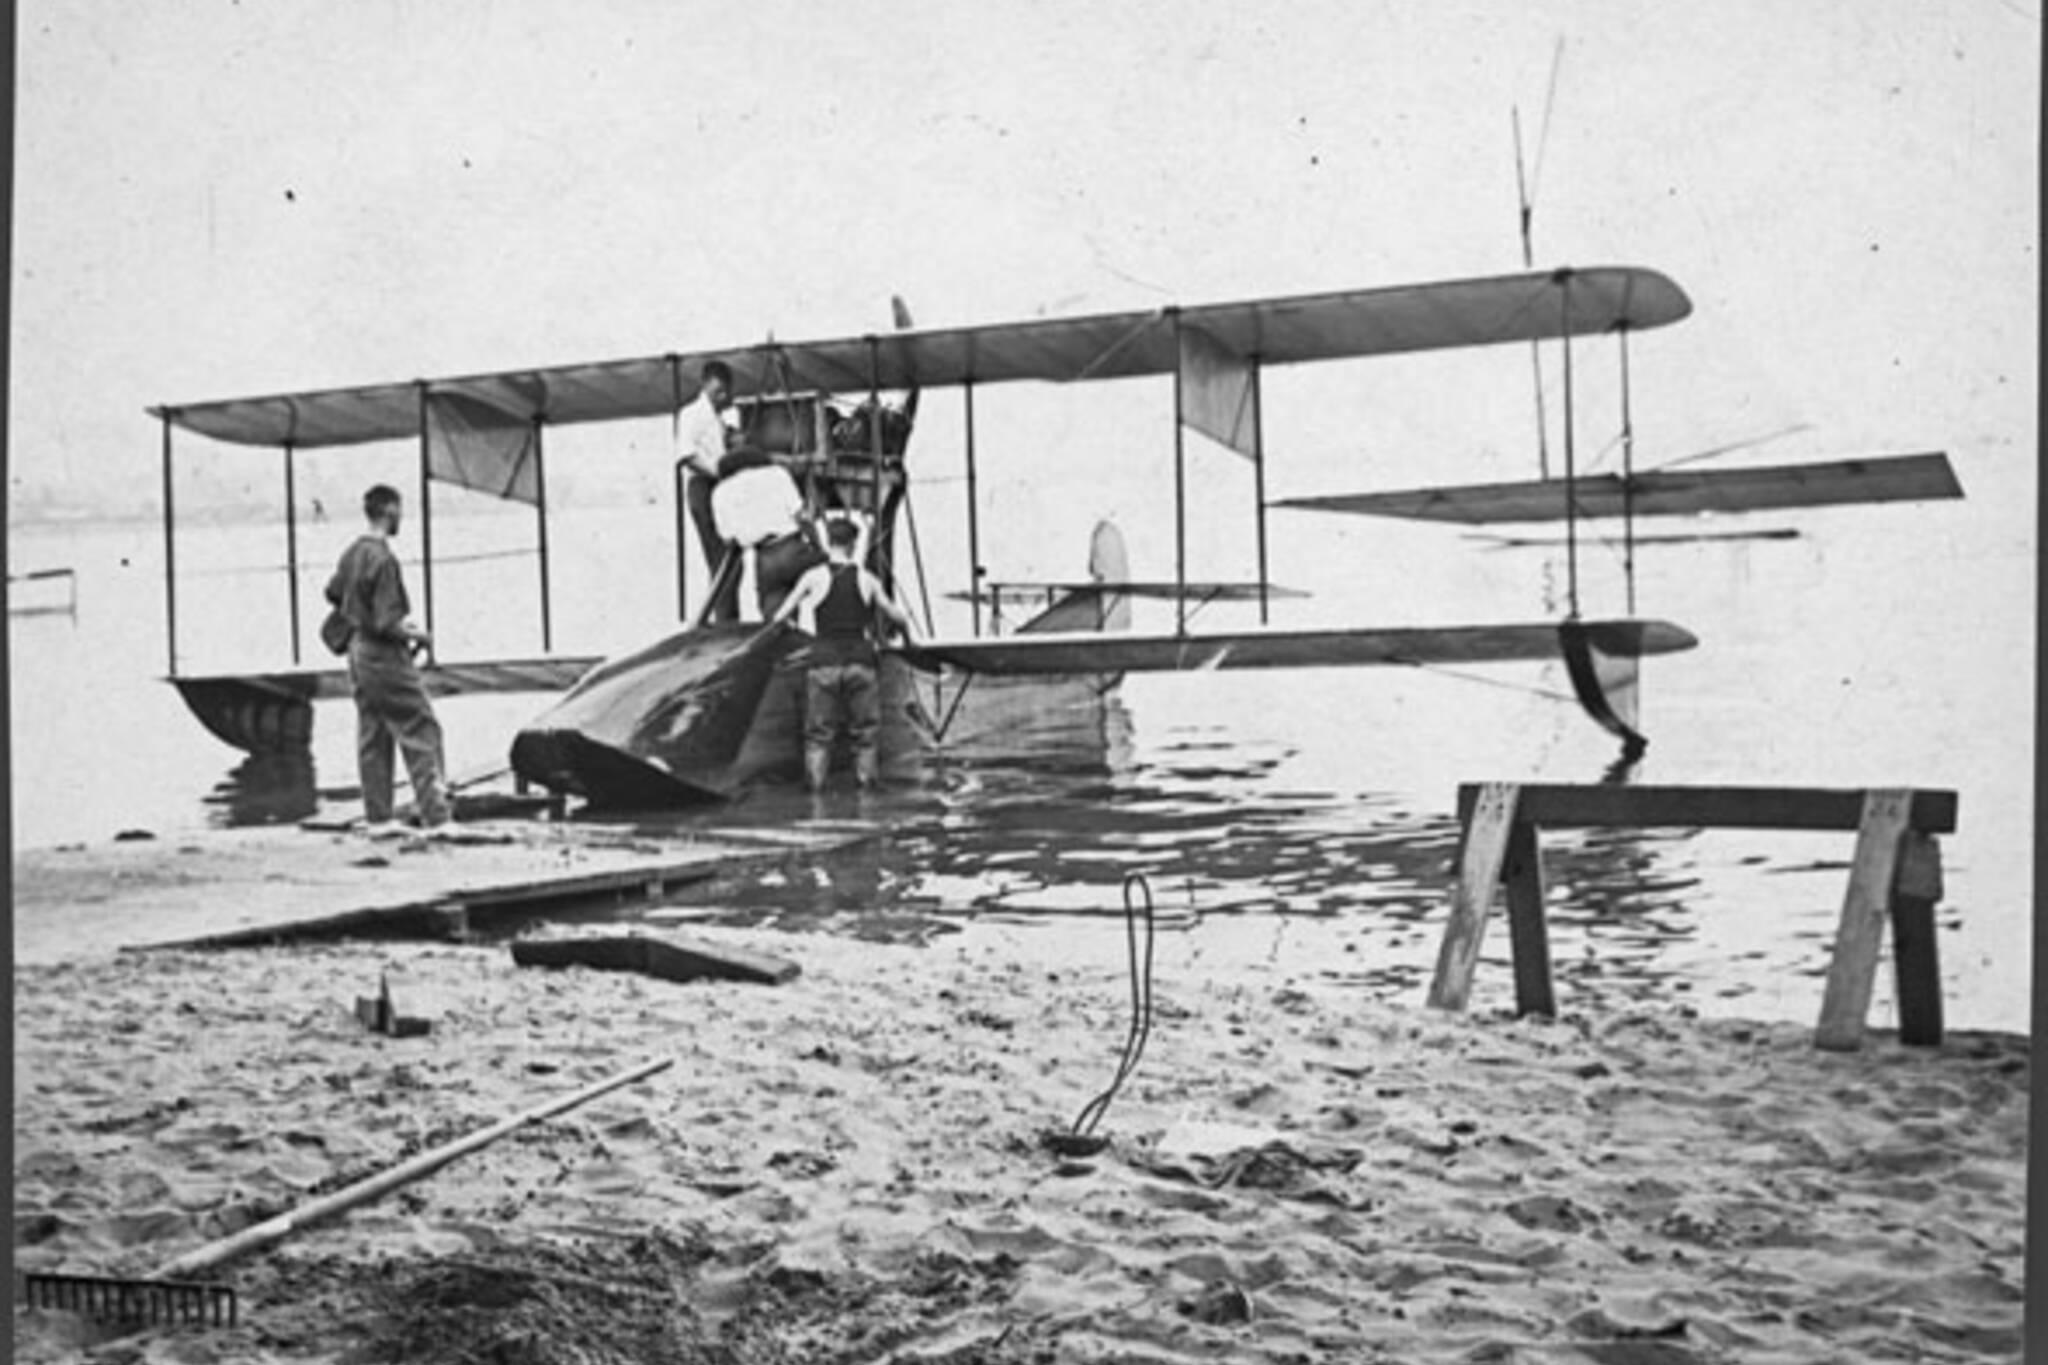 toronto sunfish aeroplane